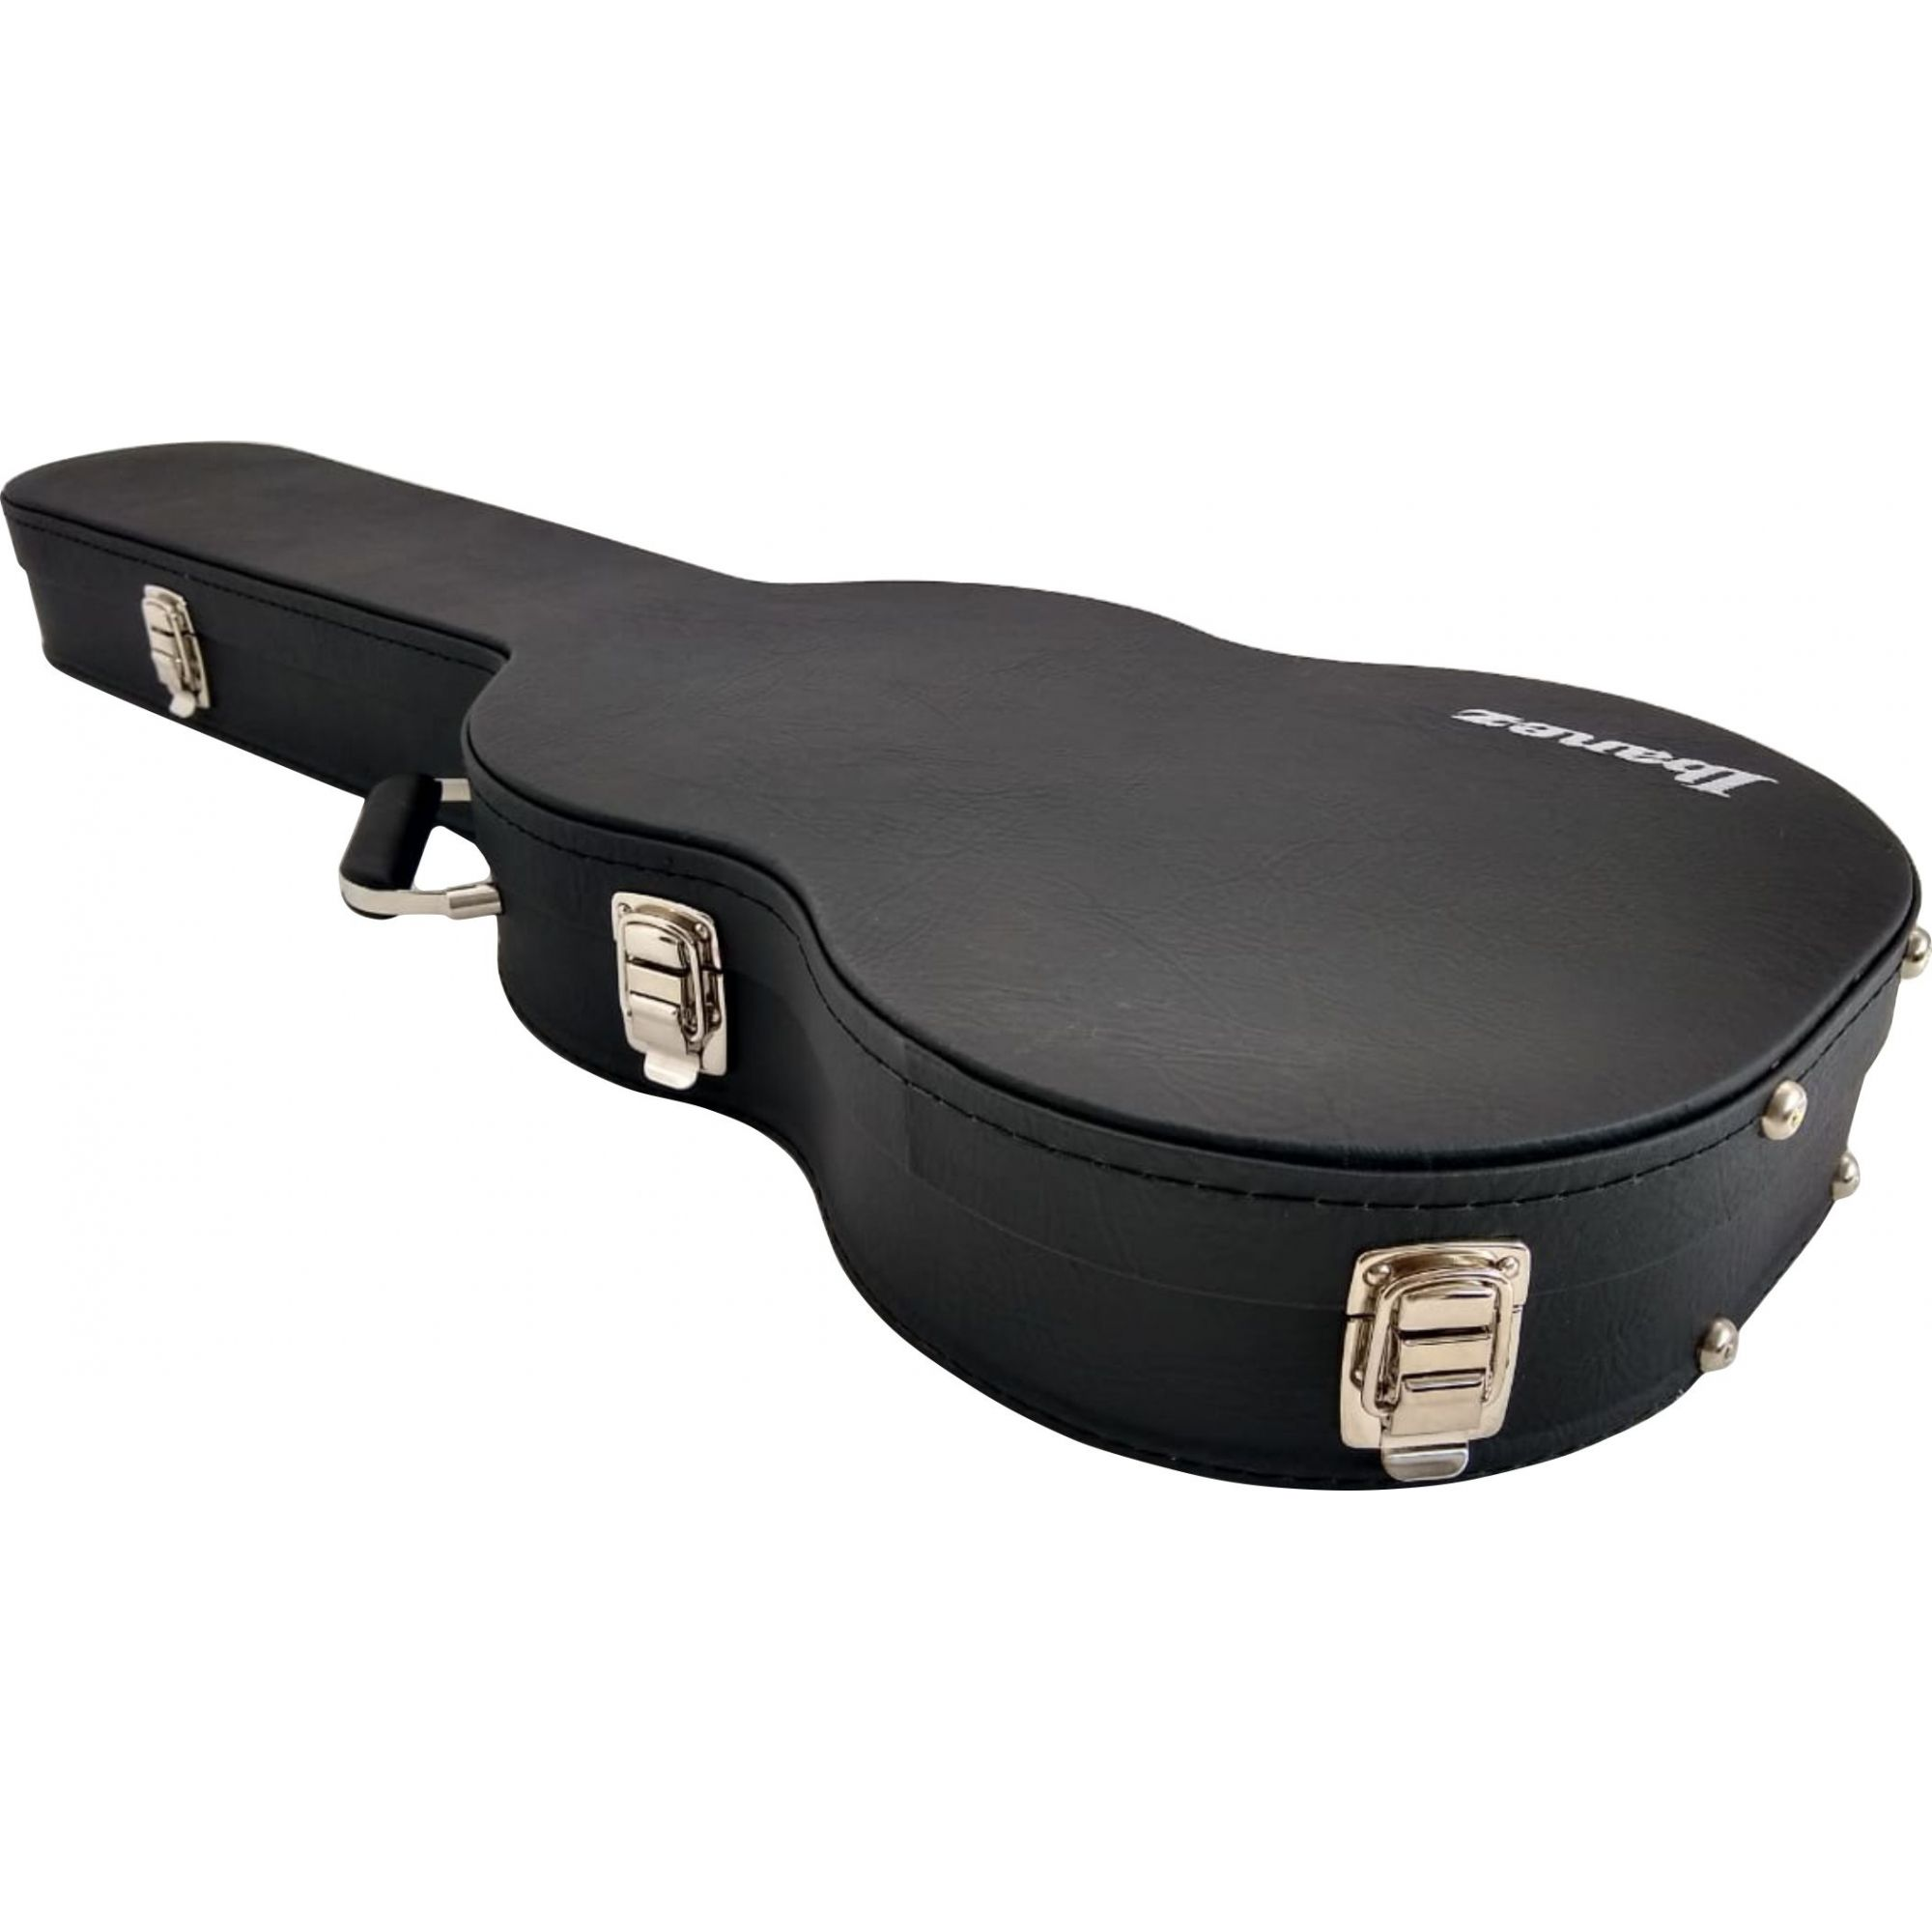 Estojo Case Guitarra Formato Sg Ibanez Epiphone Gibson Milenium